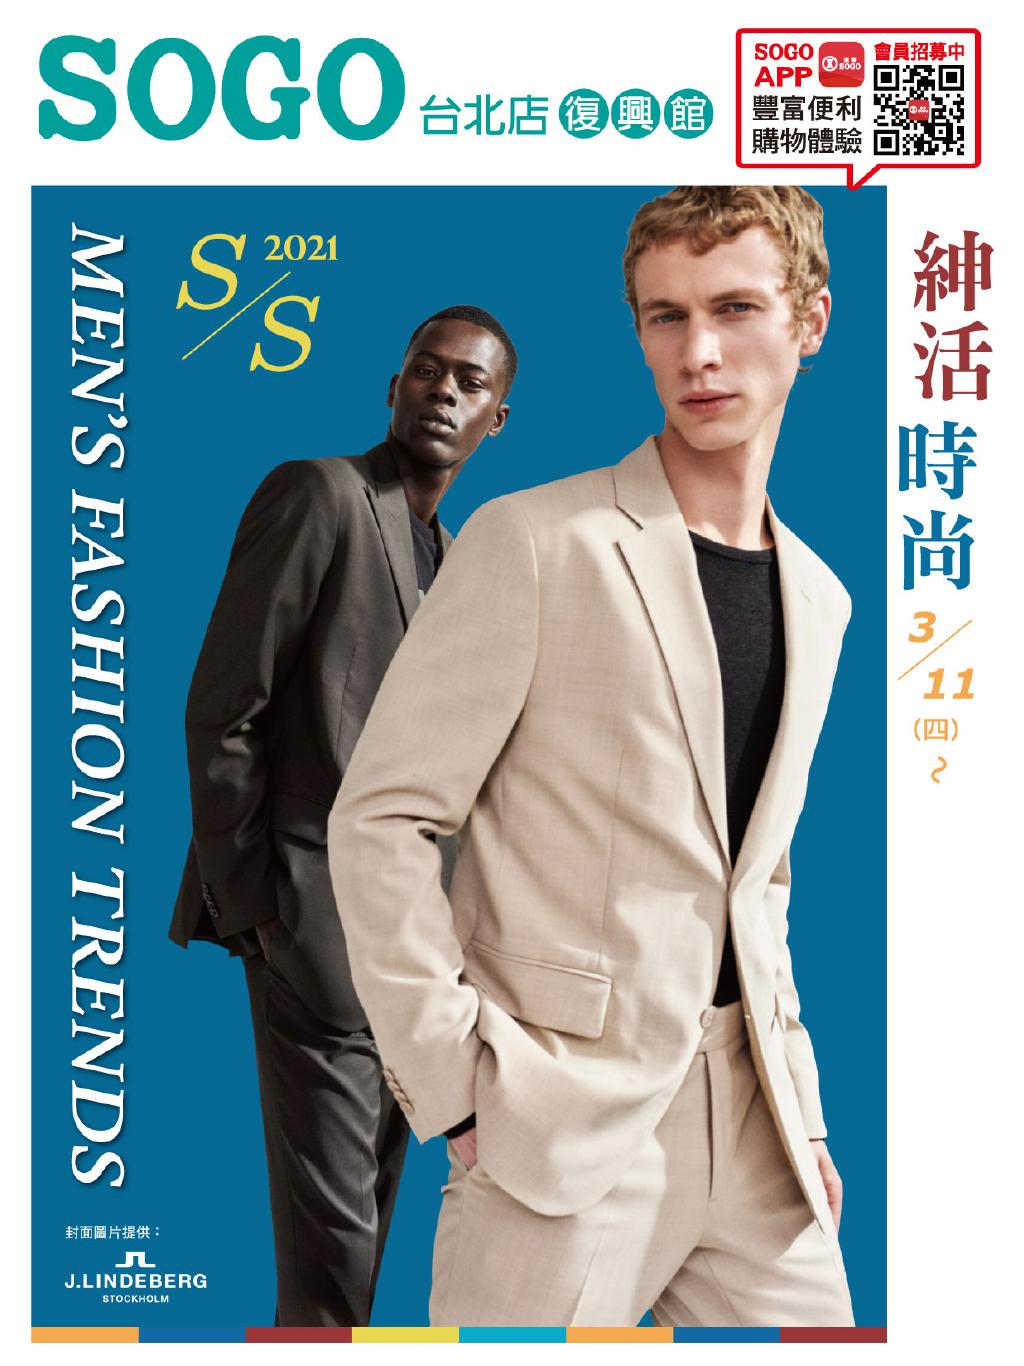 SOGO《台北復興館》「紳活時尚 2021 S/S MEN'S FASHION TRENDS」